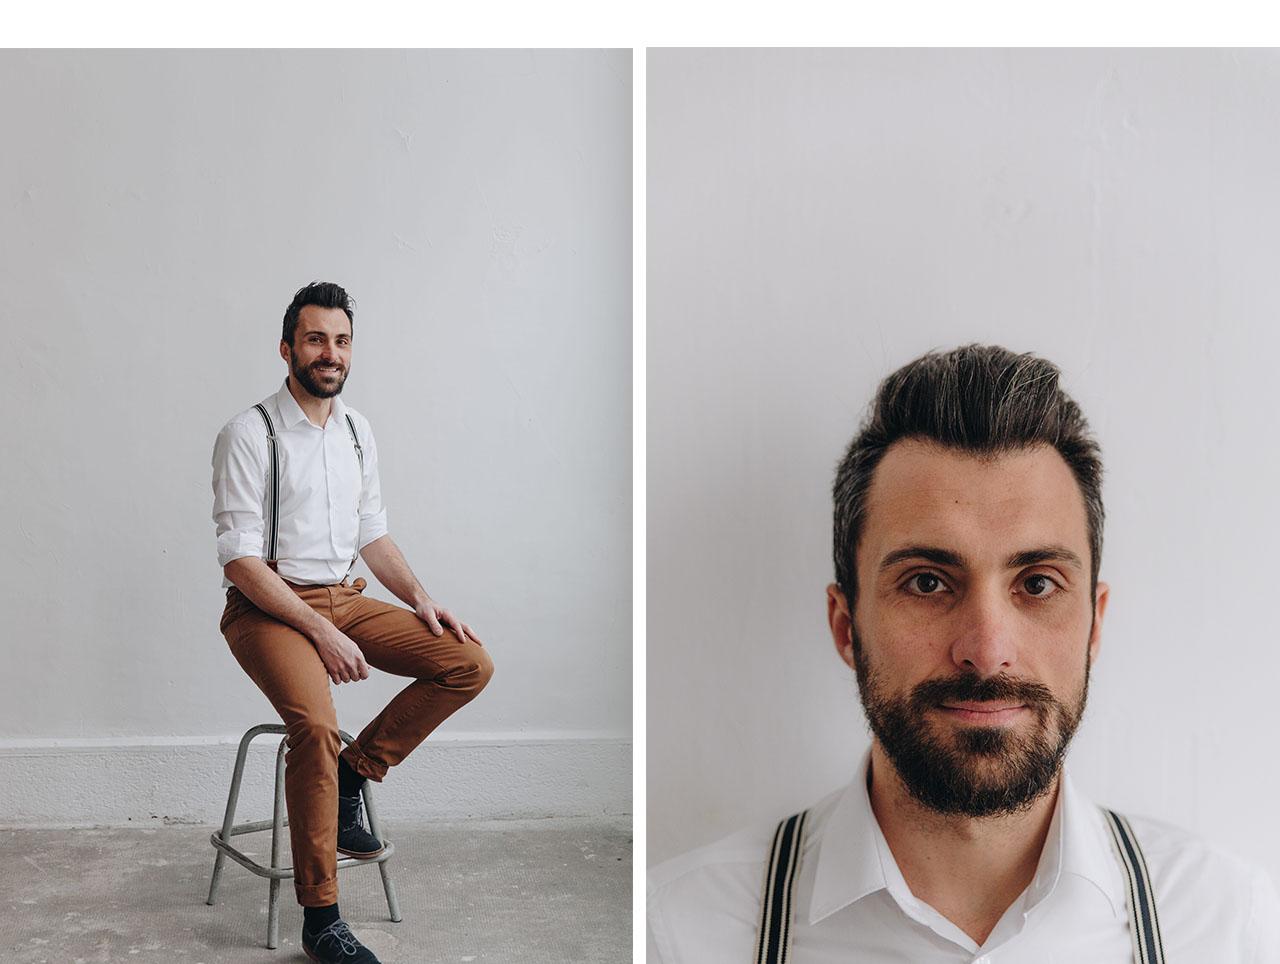 photographe portrait lyon photo profil